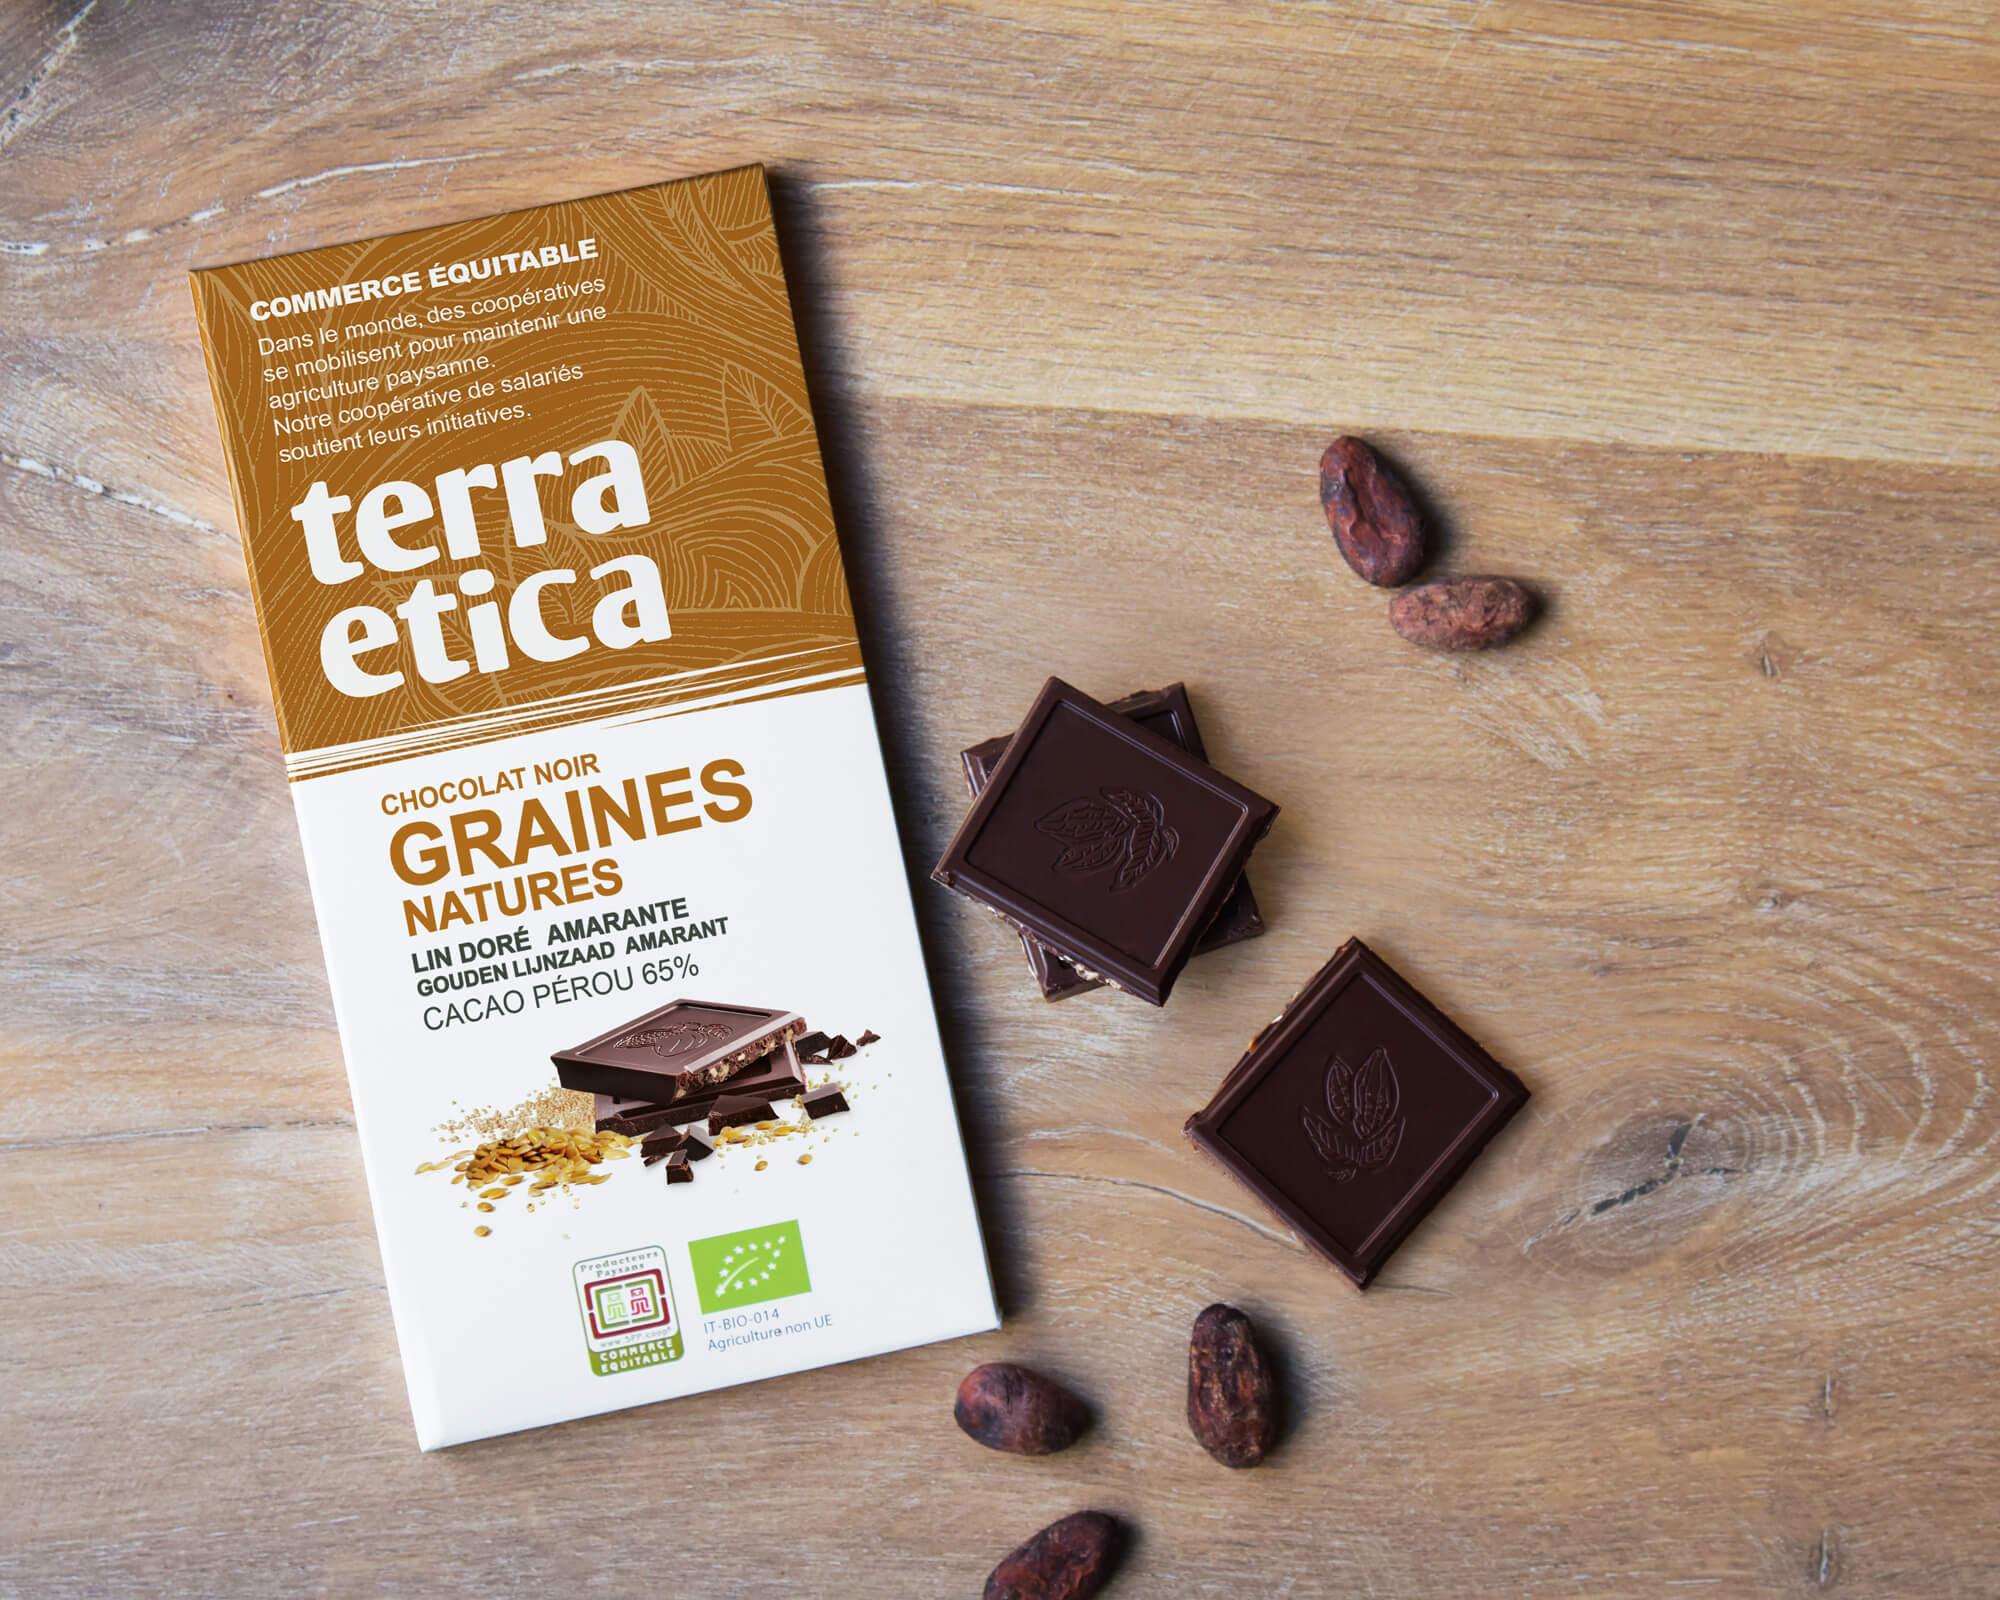 Chocolat noir graines natures bio et équitable 65% cacao I Terra Etica